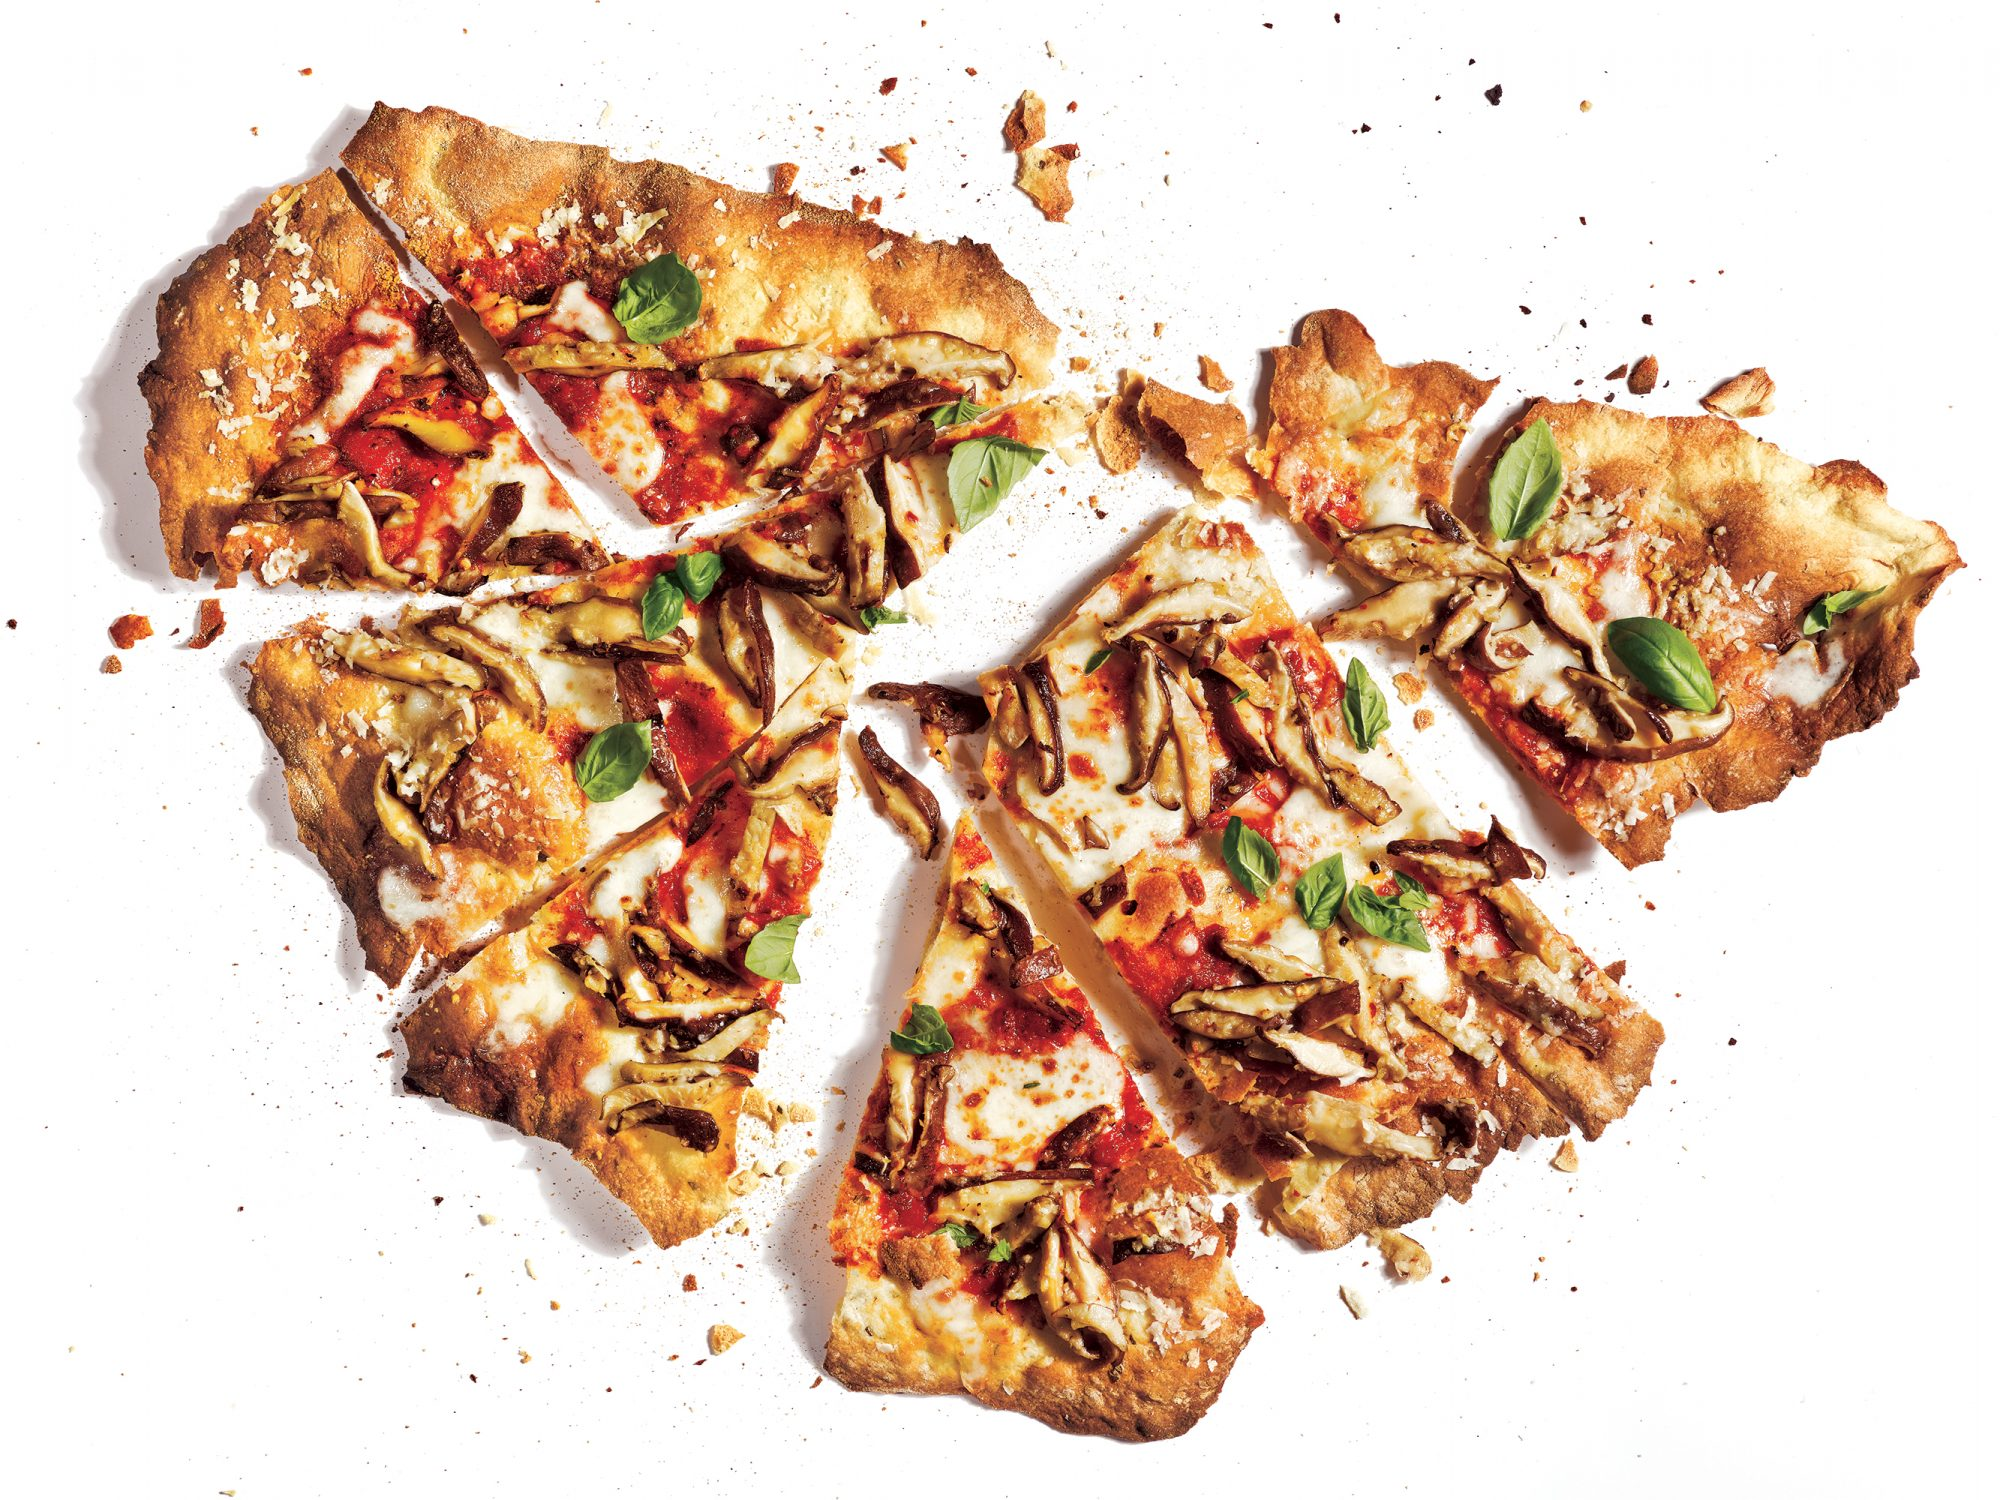 Cracker Crust Mushroom Pizza